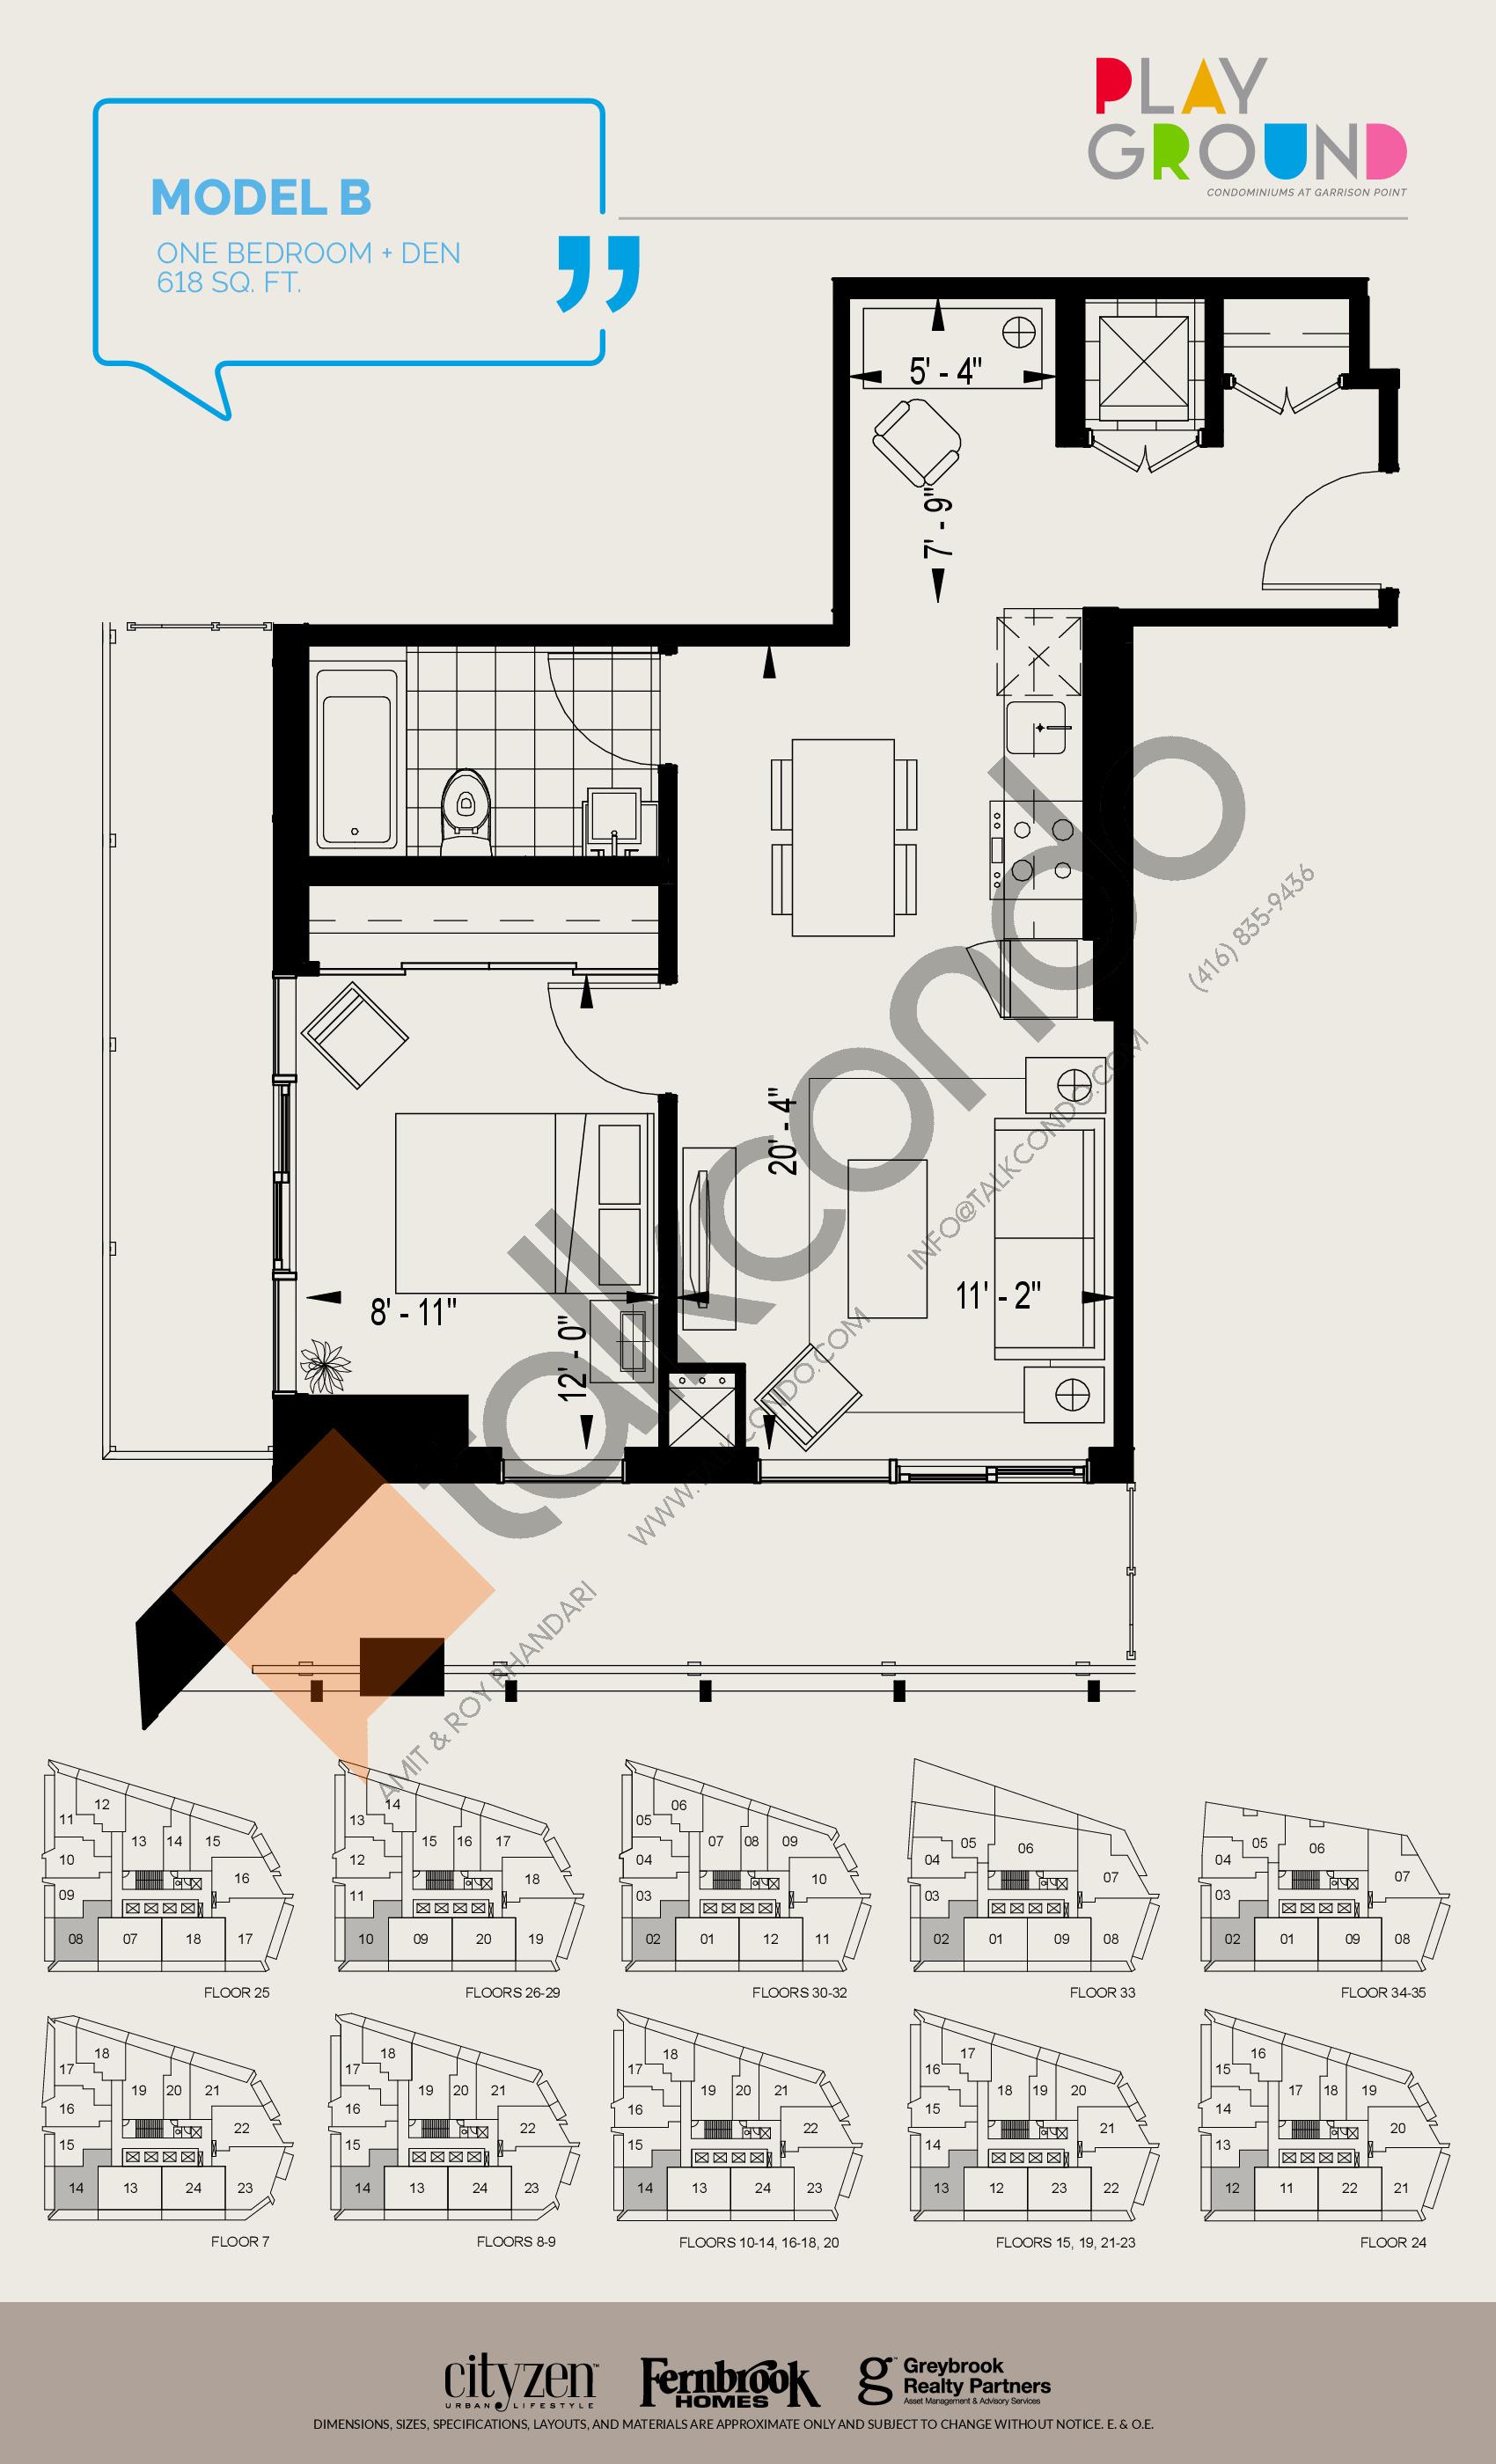 Model B Floor Plan at Playground Condos at Garrison Point - 618 sq.ft